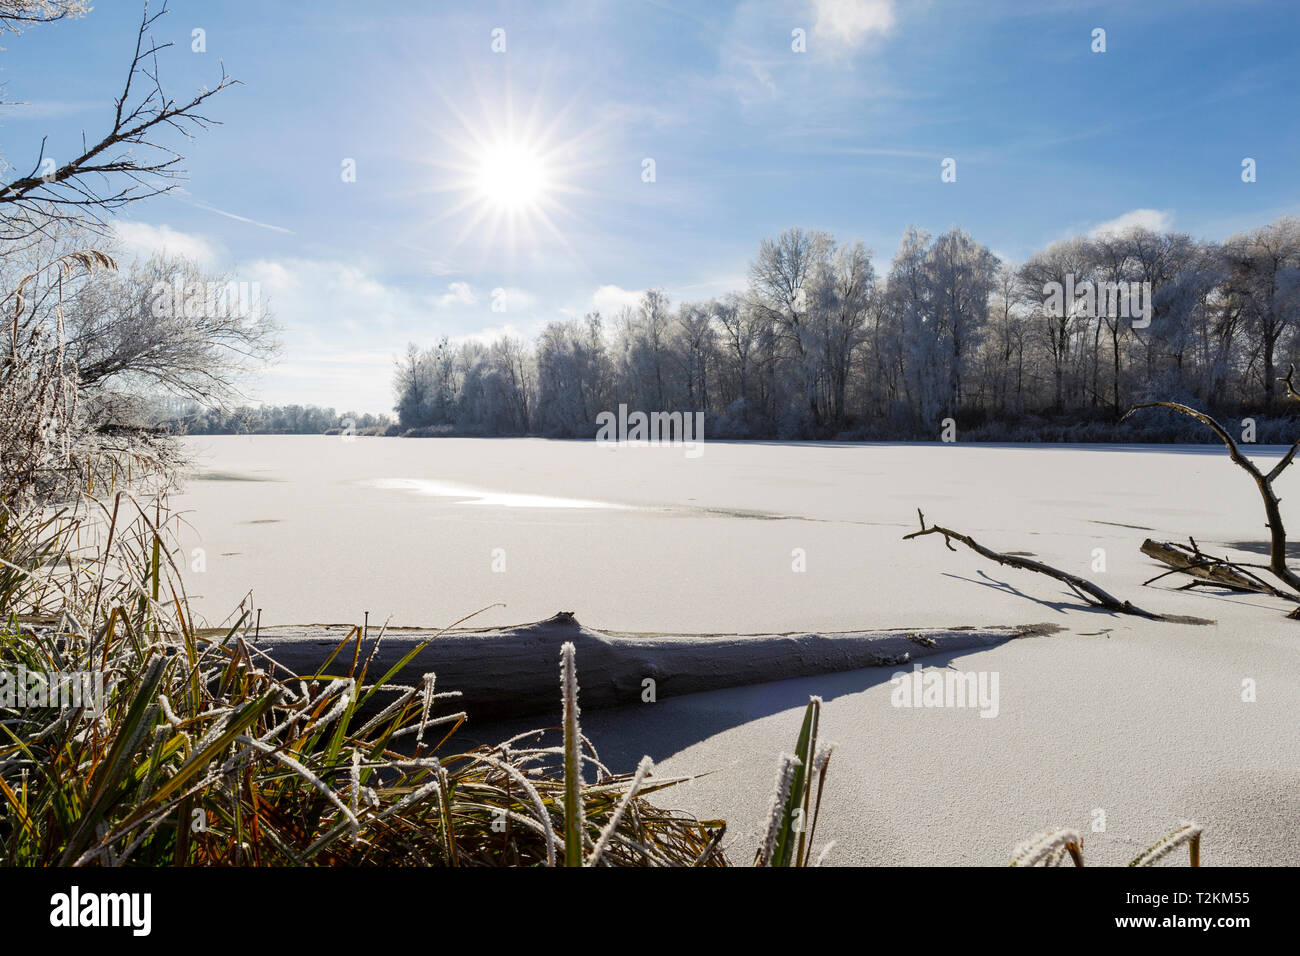 Winter am Altwasser - Stock Image